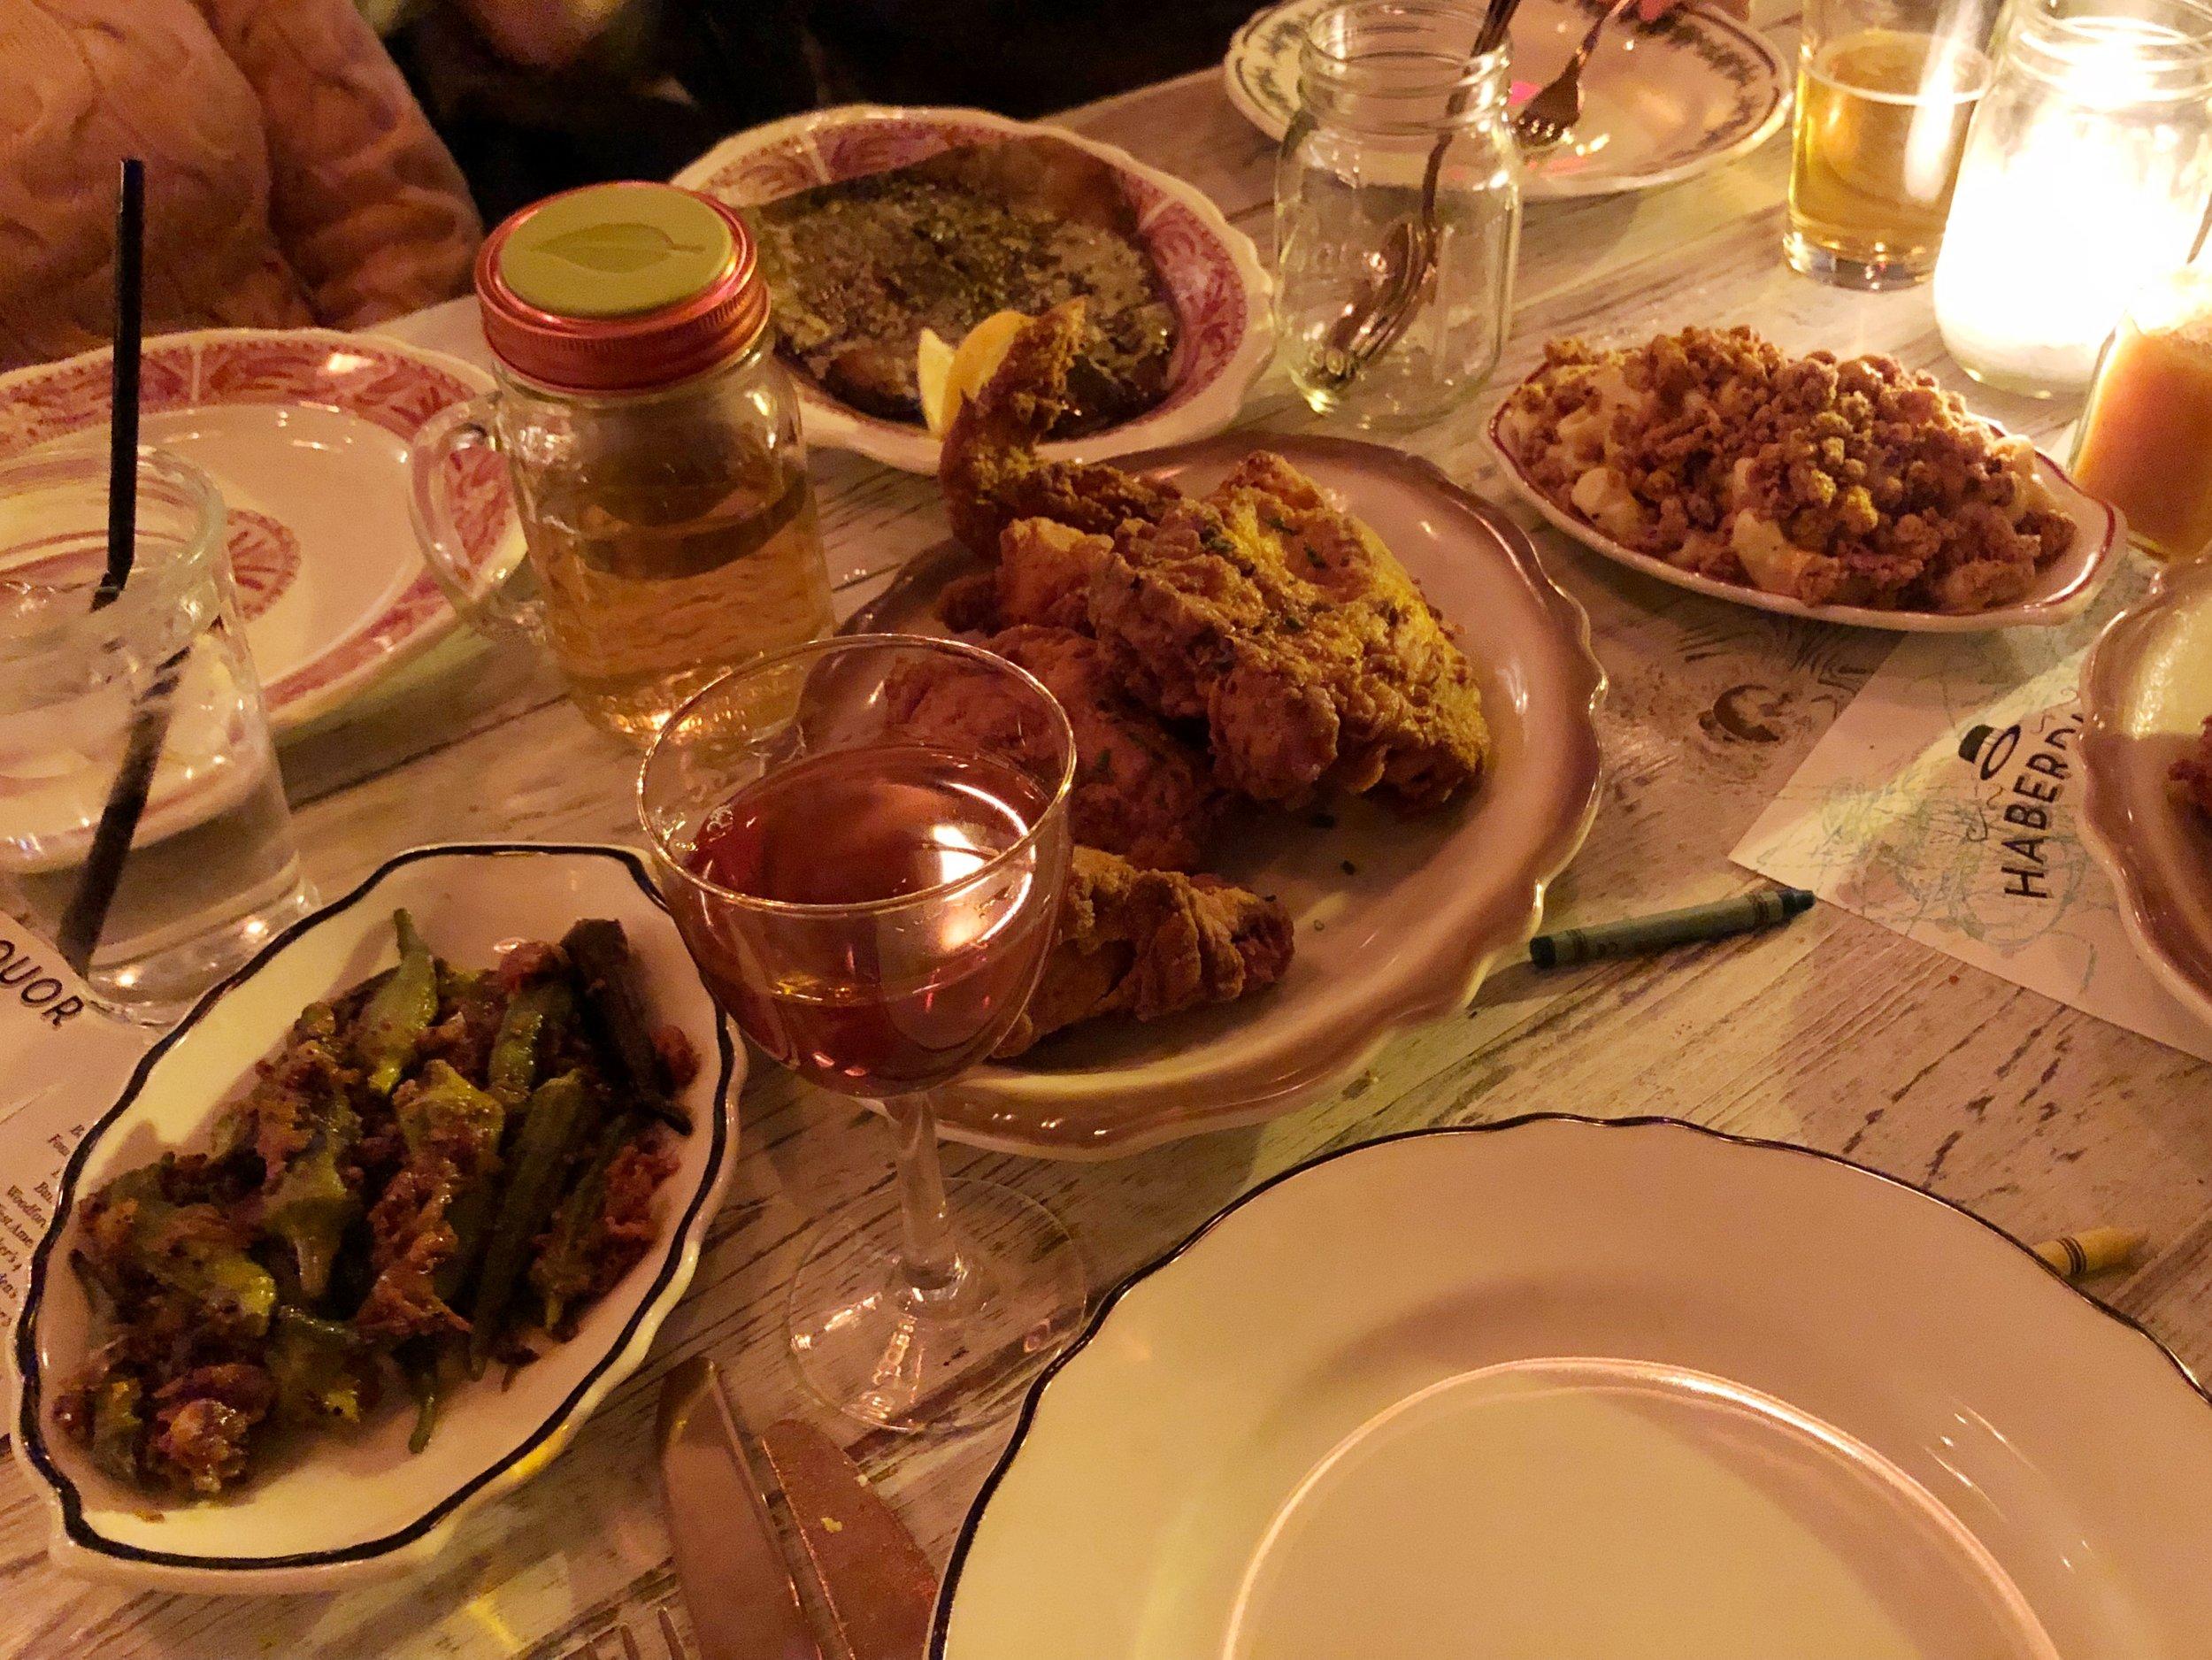 Okra, Fried Chicken, Trout, Mac & Cheese